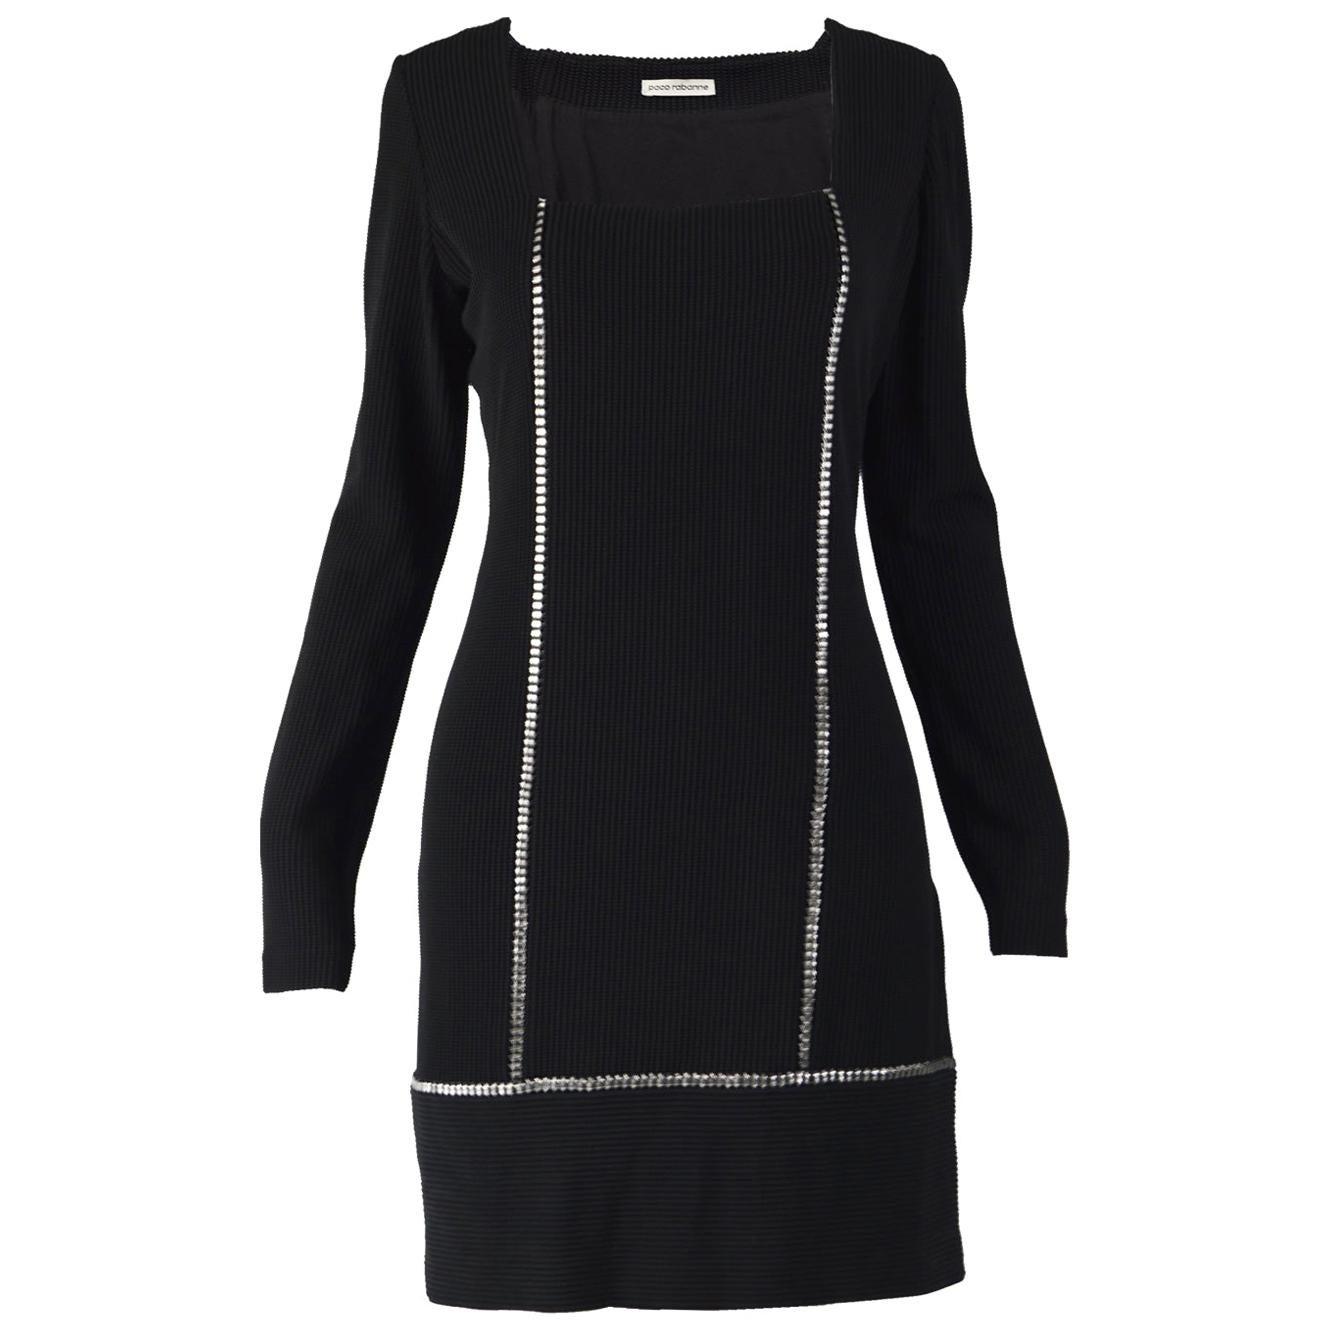 Paco Rabanne Black & Silver Party Dress